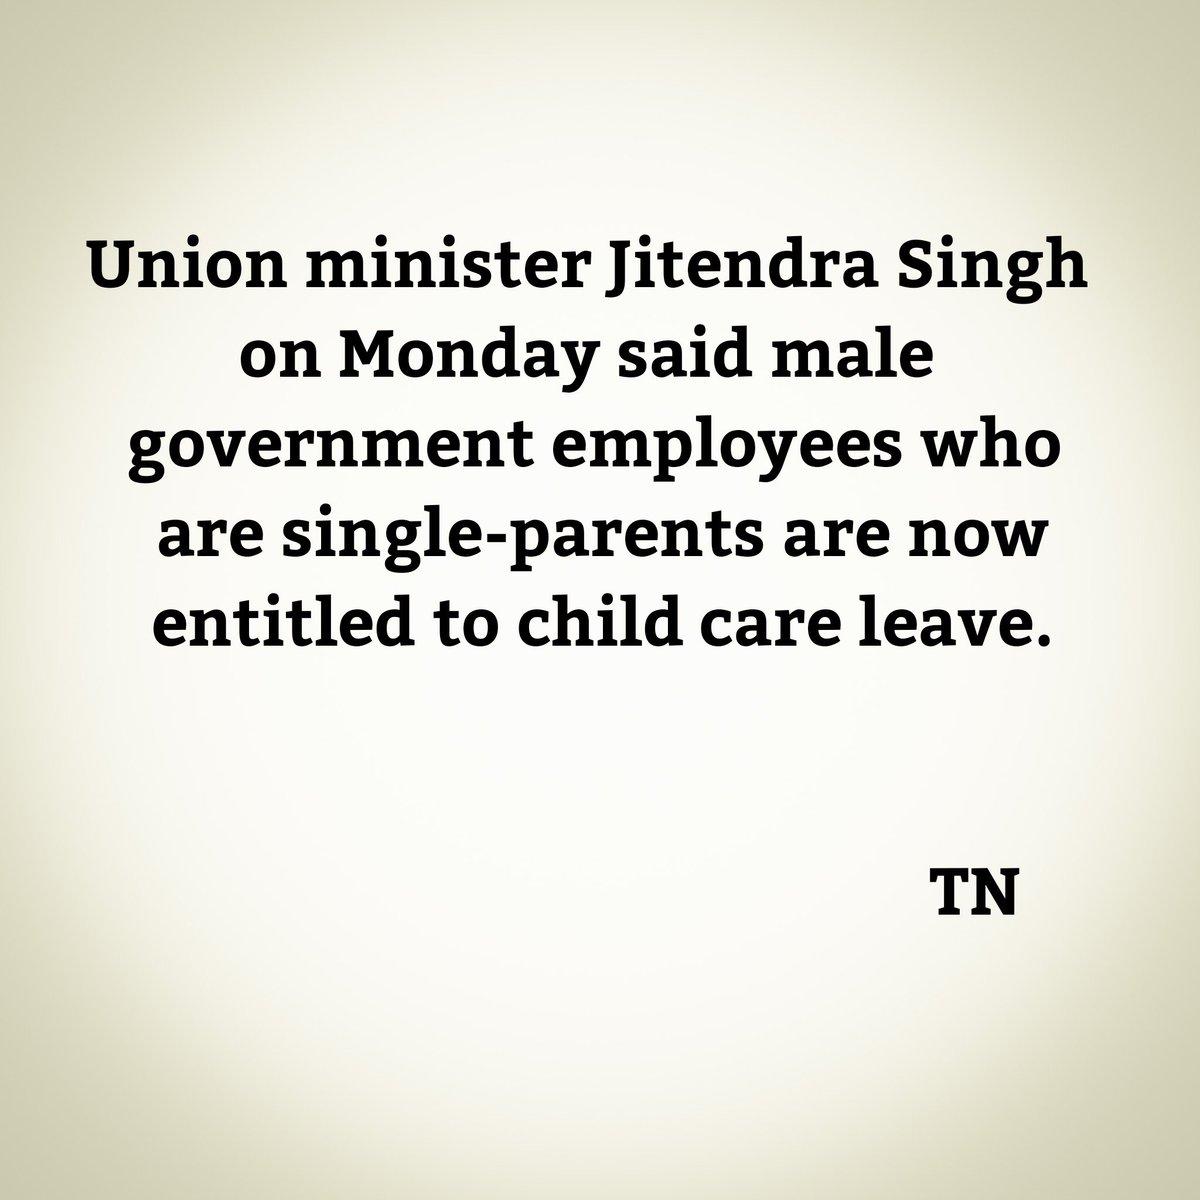 Union minister Jitendra Singh on Monday saidmale government employeeswhoaresingle parentsarenowentitledtochild care leave.#Governance #Newsnight #child #women #equality #INDIAN #justice #goodnotes. https://t.co/nu7fALc7sX